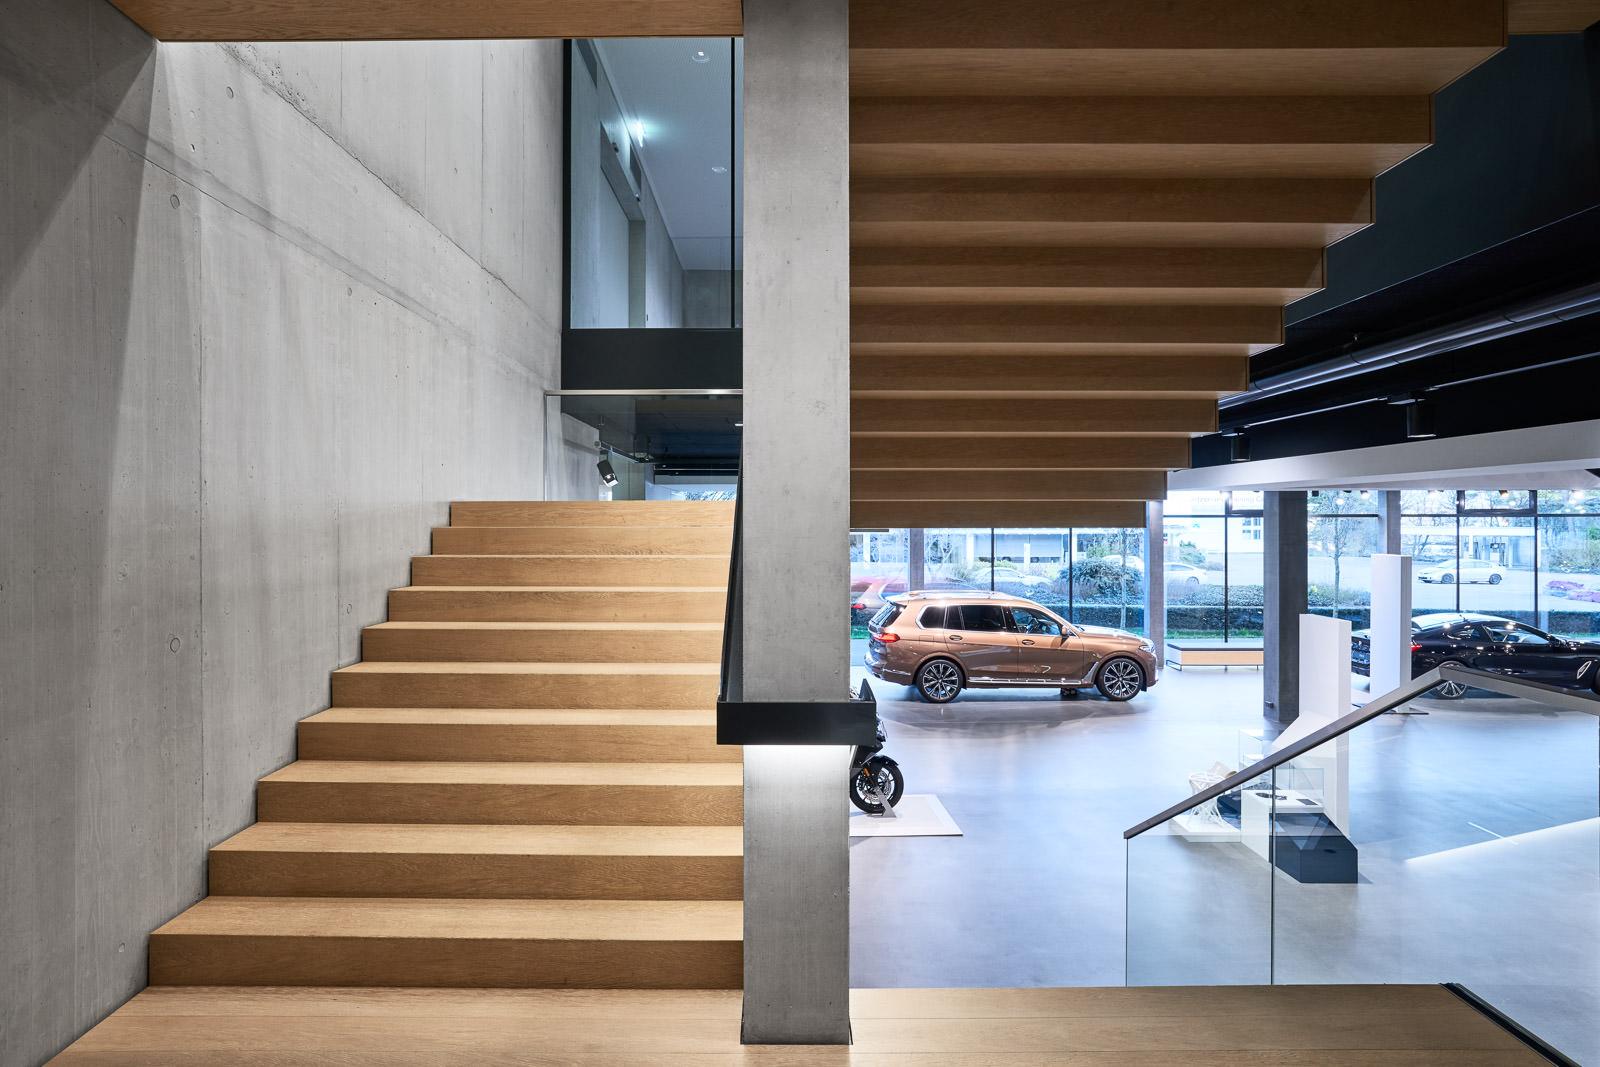 Interior Design Fotografie - Verkaufsräume Showroom Präsentationsräume